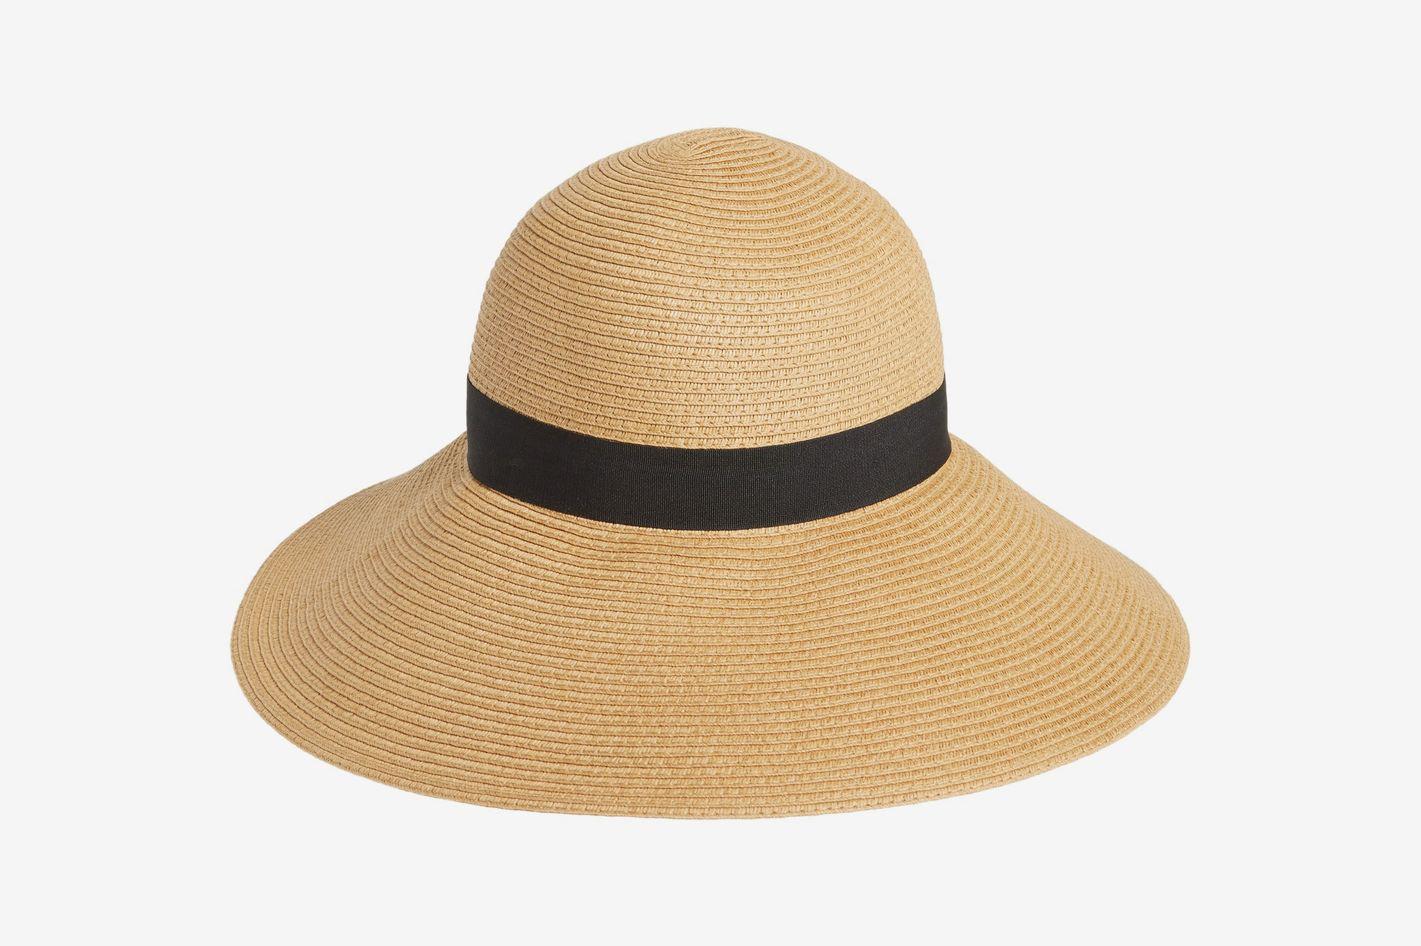 2a567ff2ed4 28 Best Sun Hats 2018 — Woven Straw Hats